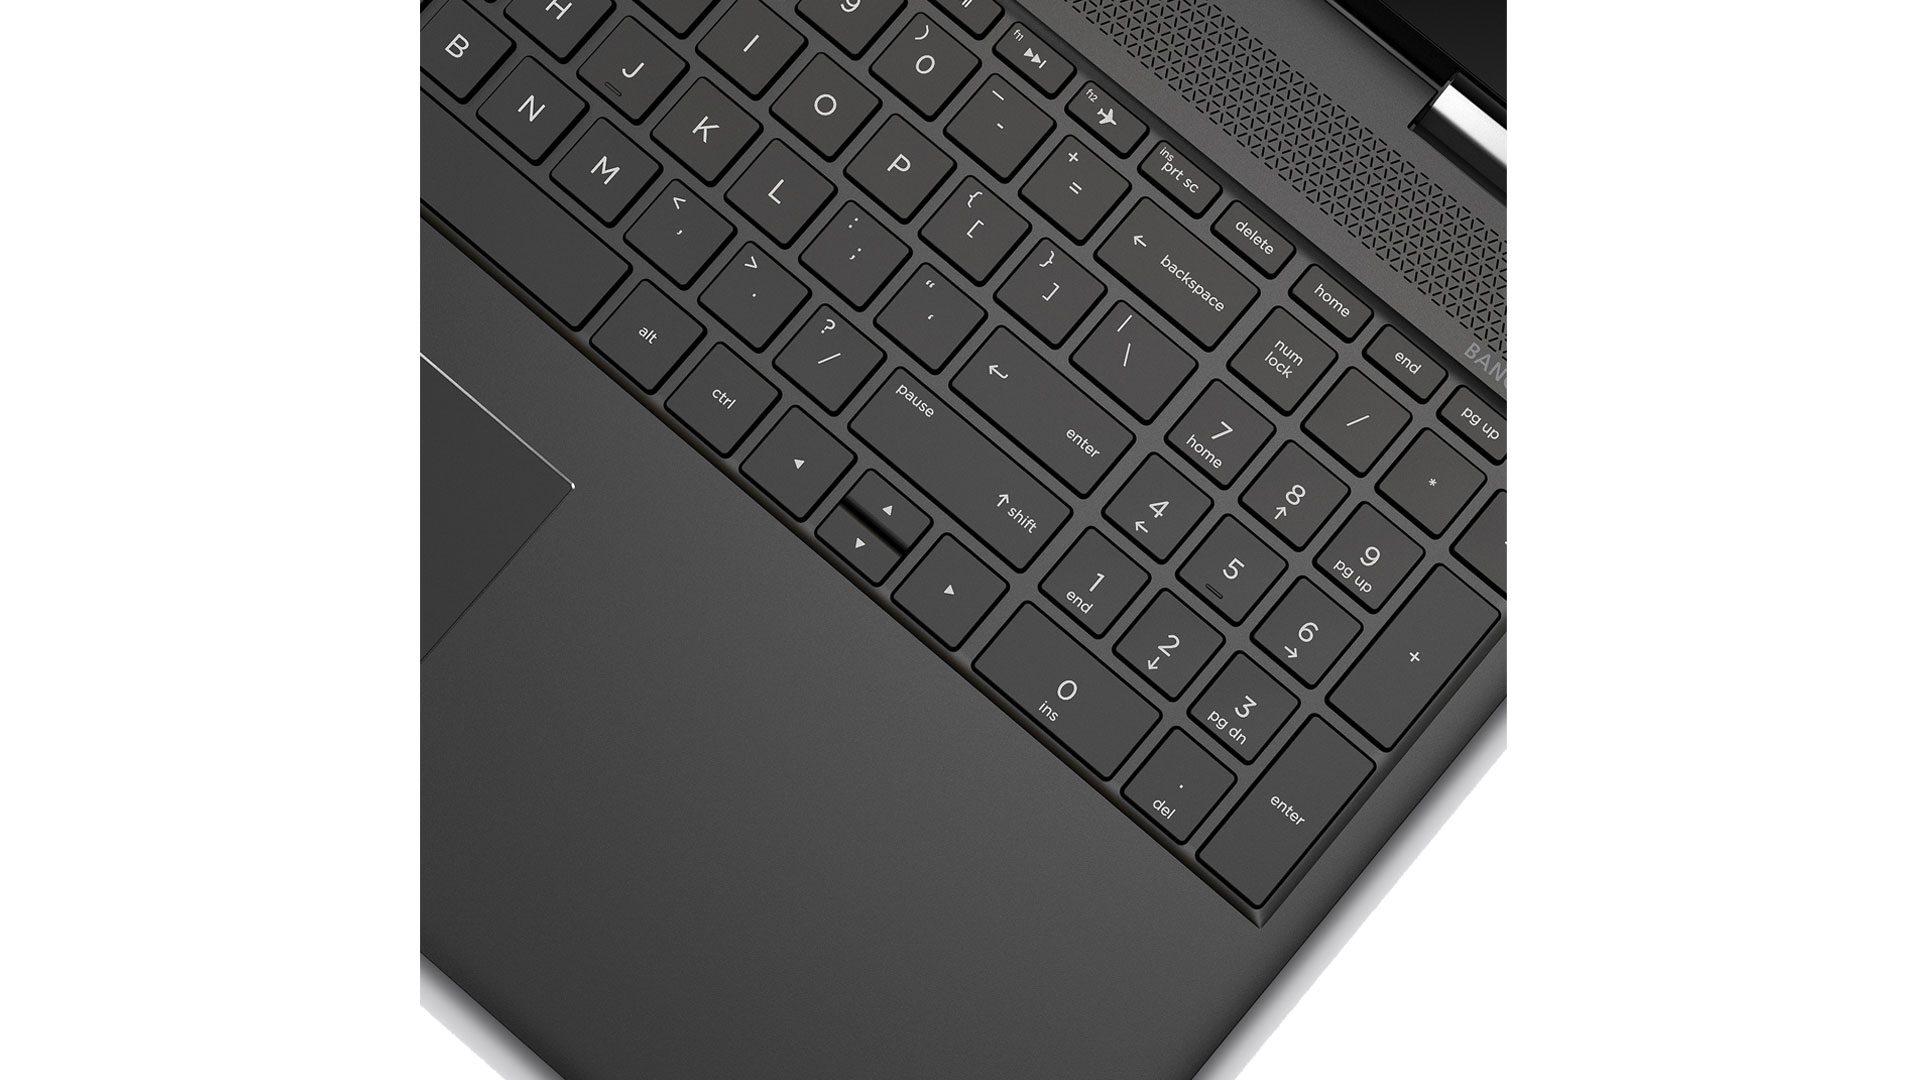 HP-Envy-x360-15-bq102ng_Tastatur-1